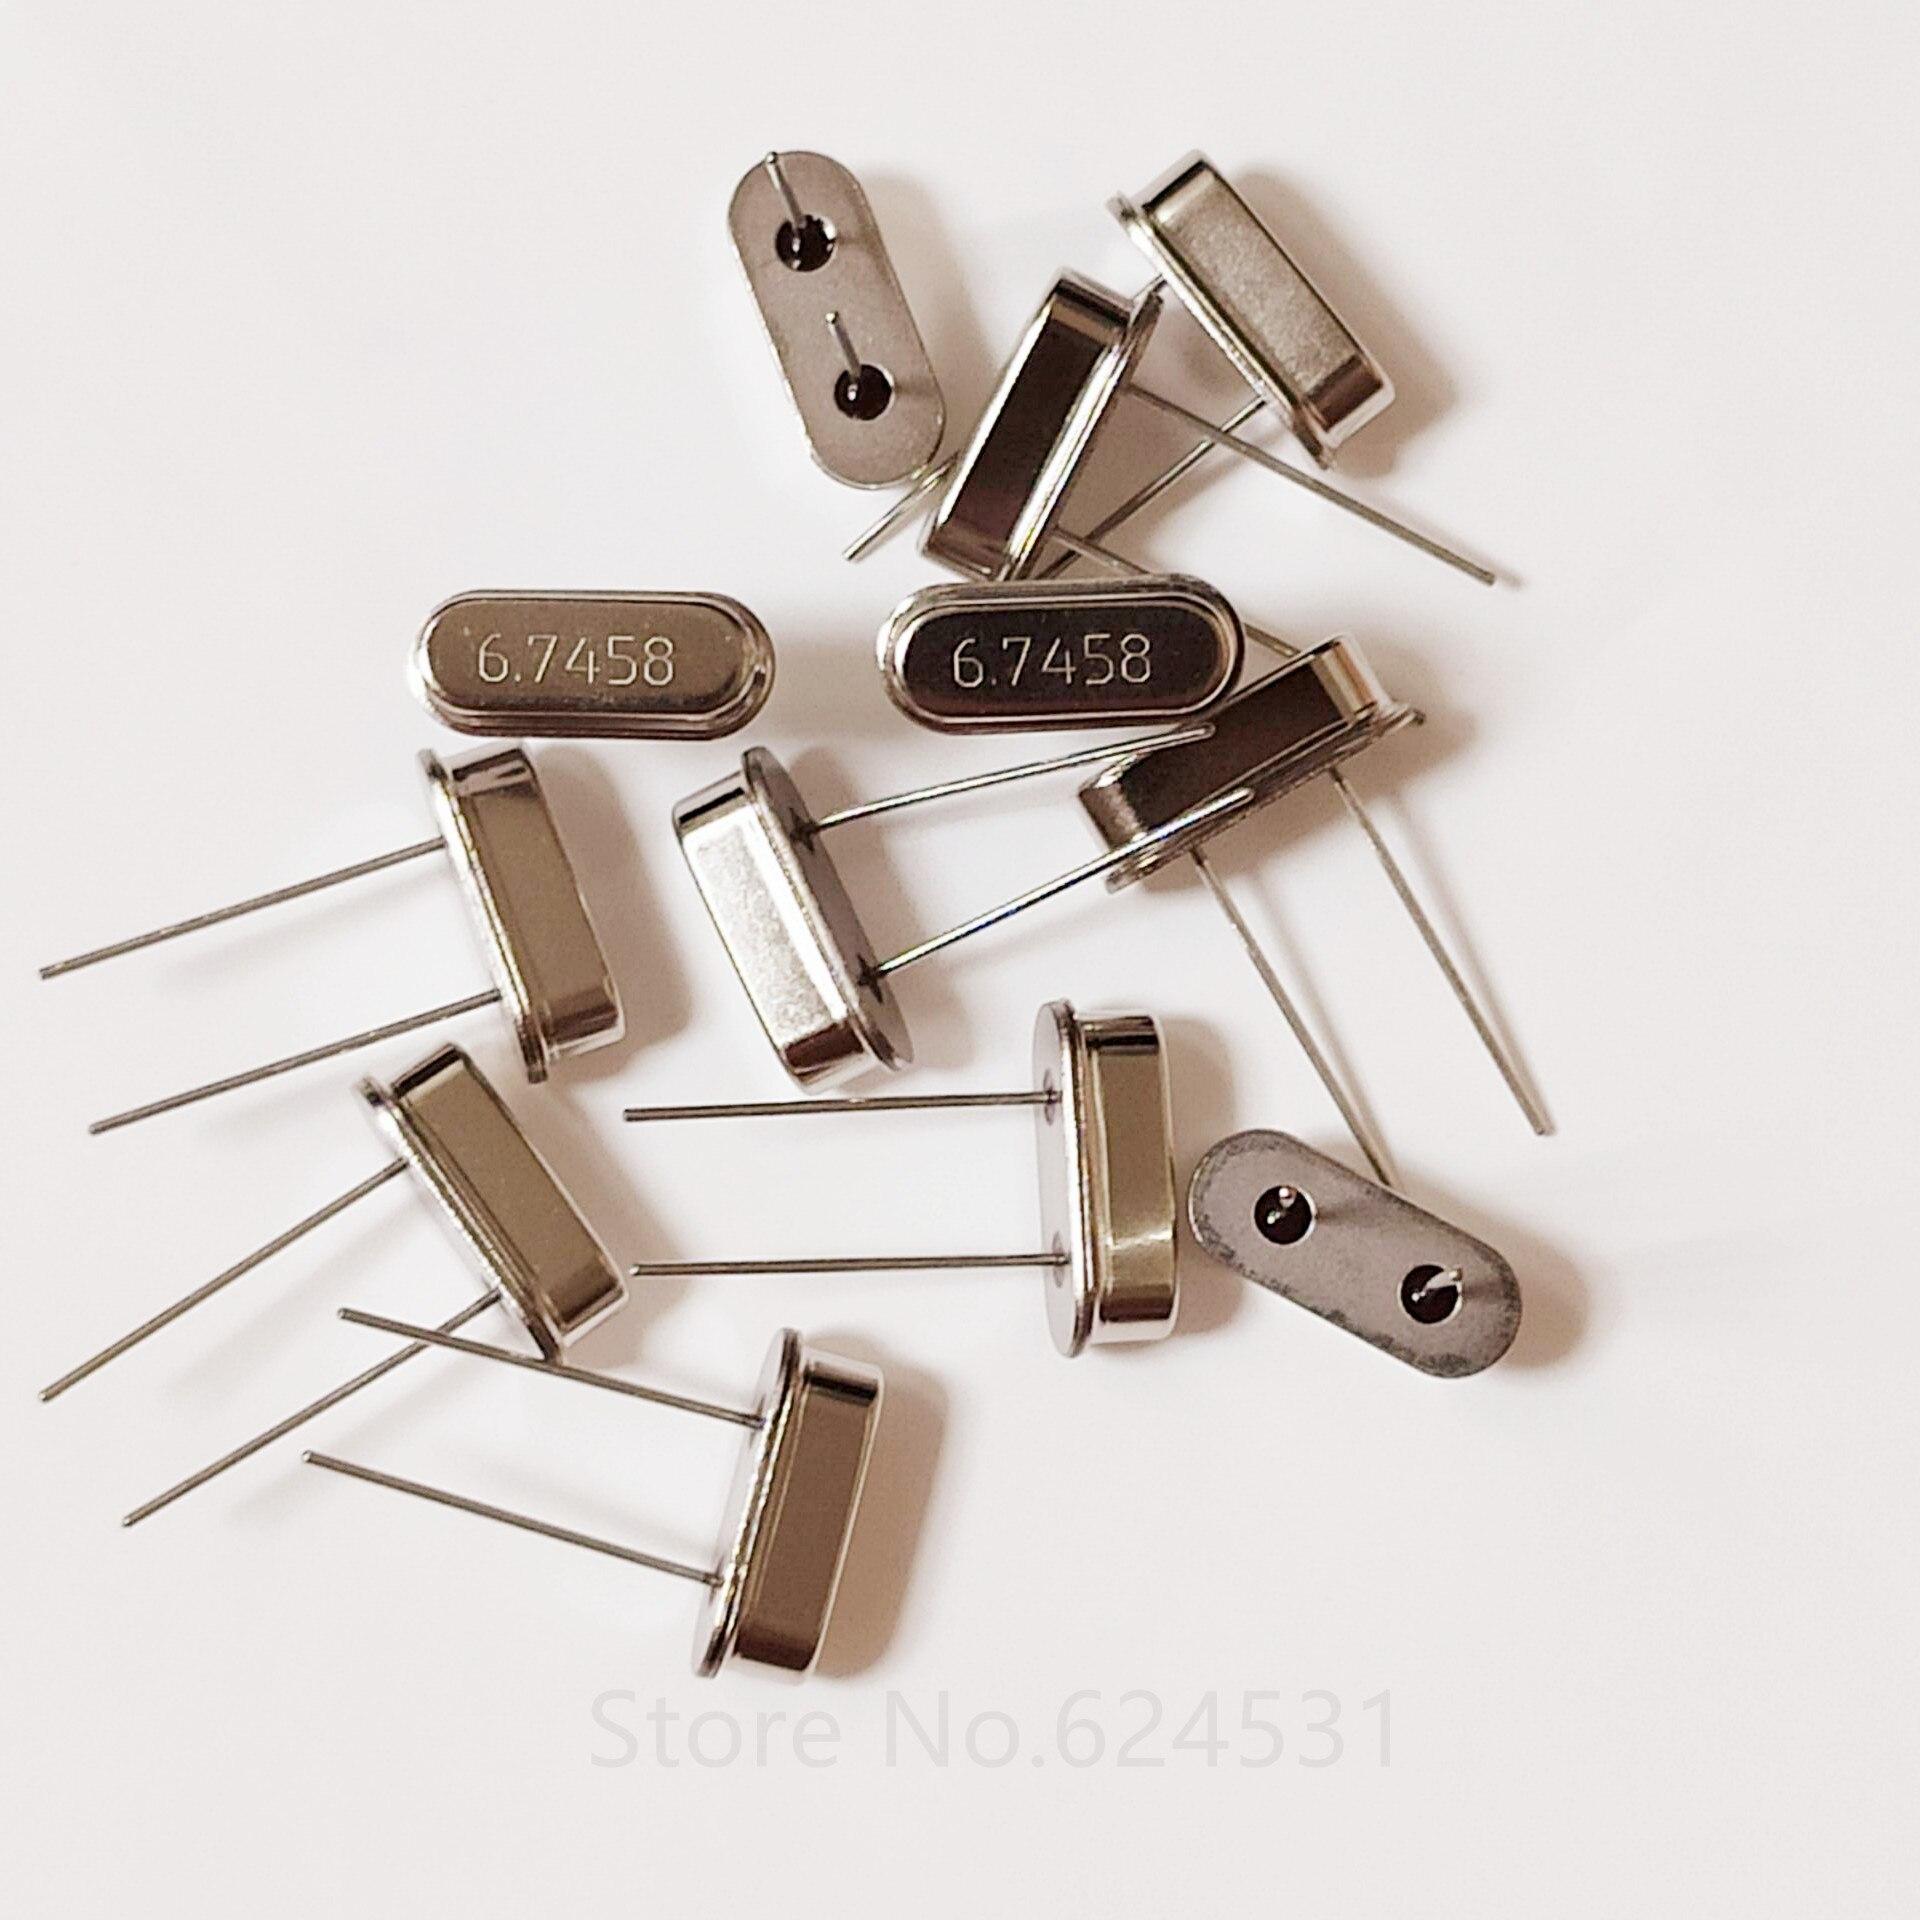 10pcs Passive In-Line Crystal Oscillator HC-49S 49S 2 Legs 2P DIP-2 6.7458M 6.7458MHZ Crystal Resonator